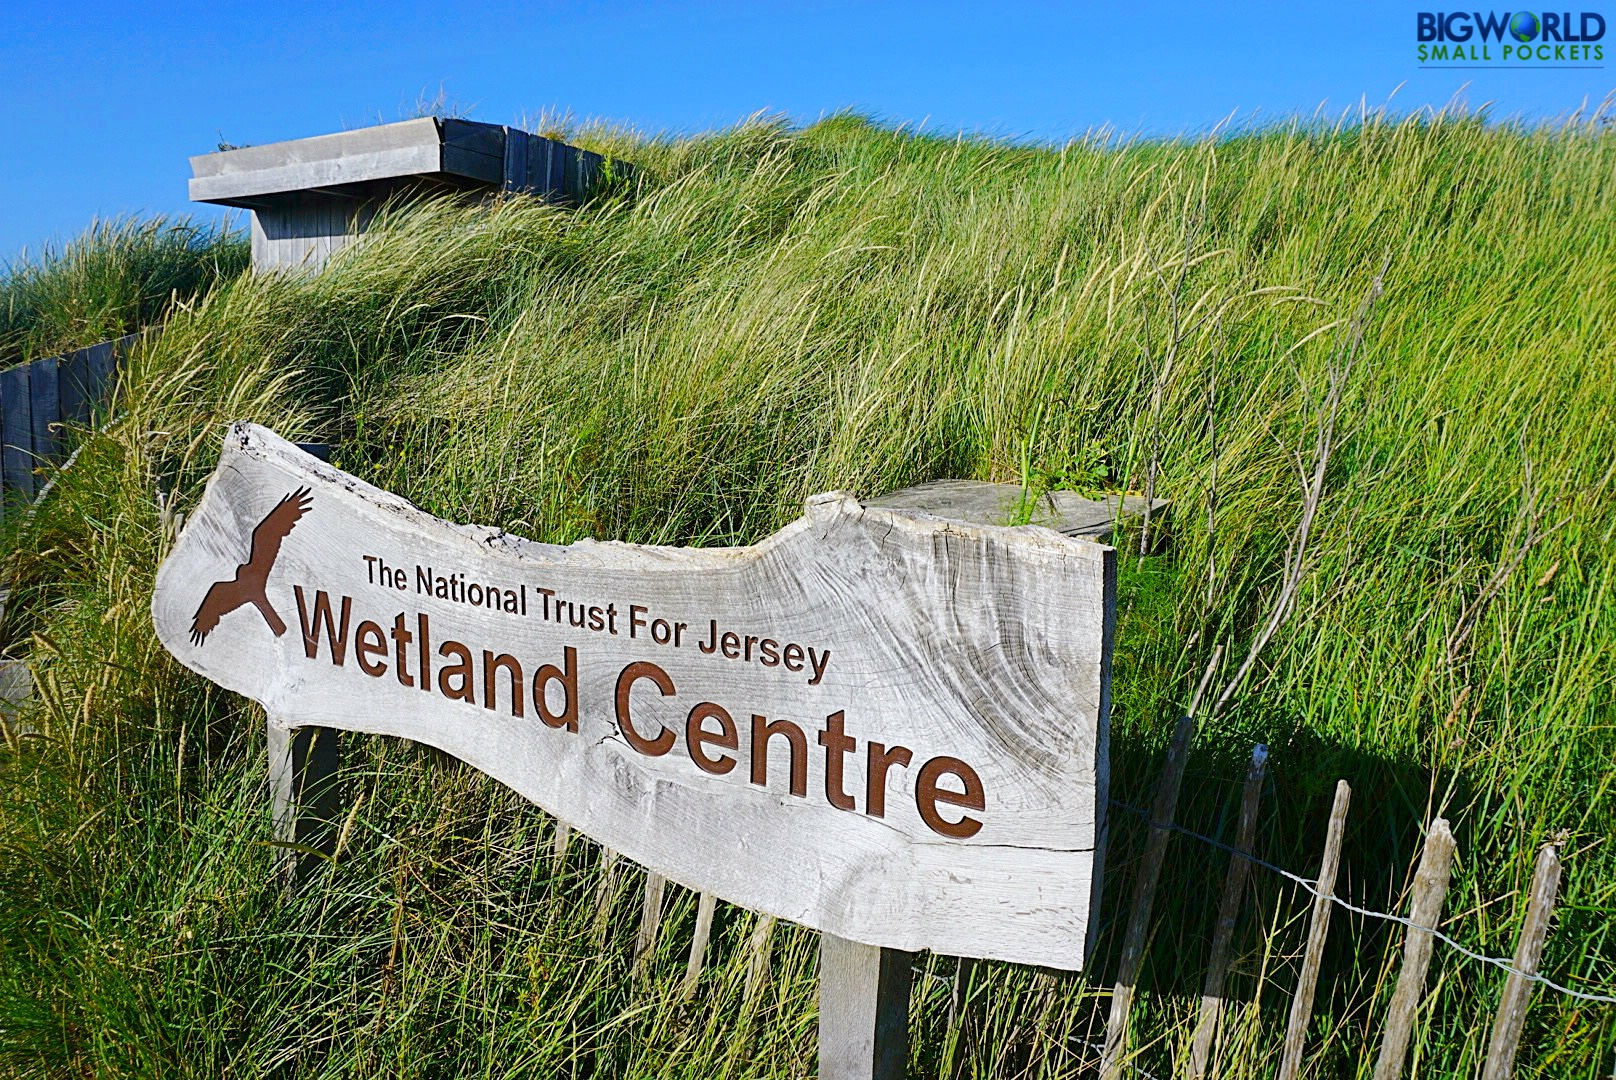 Jersey Wetland Centre